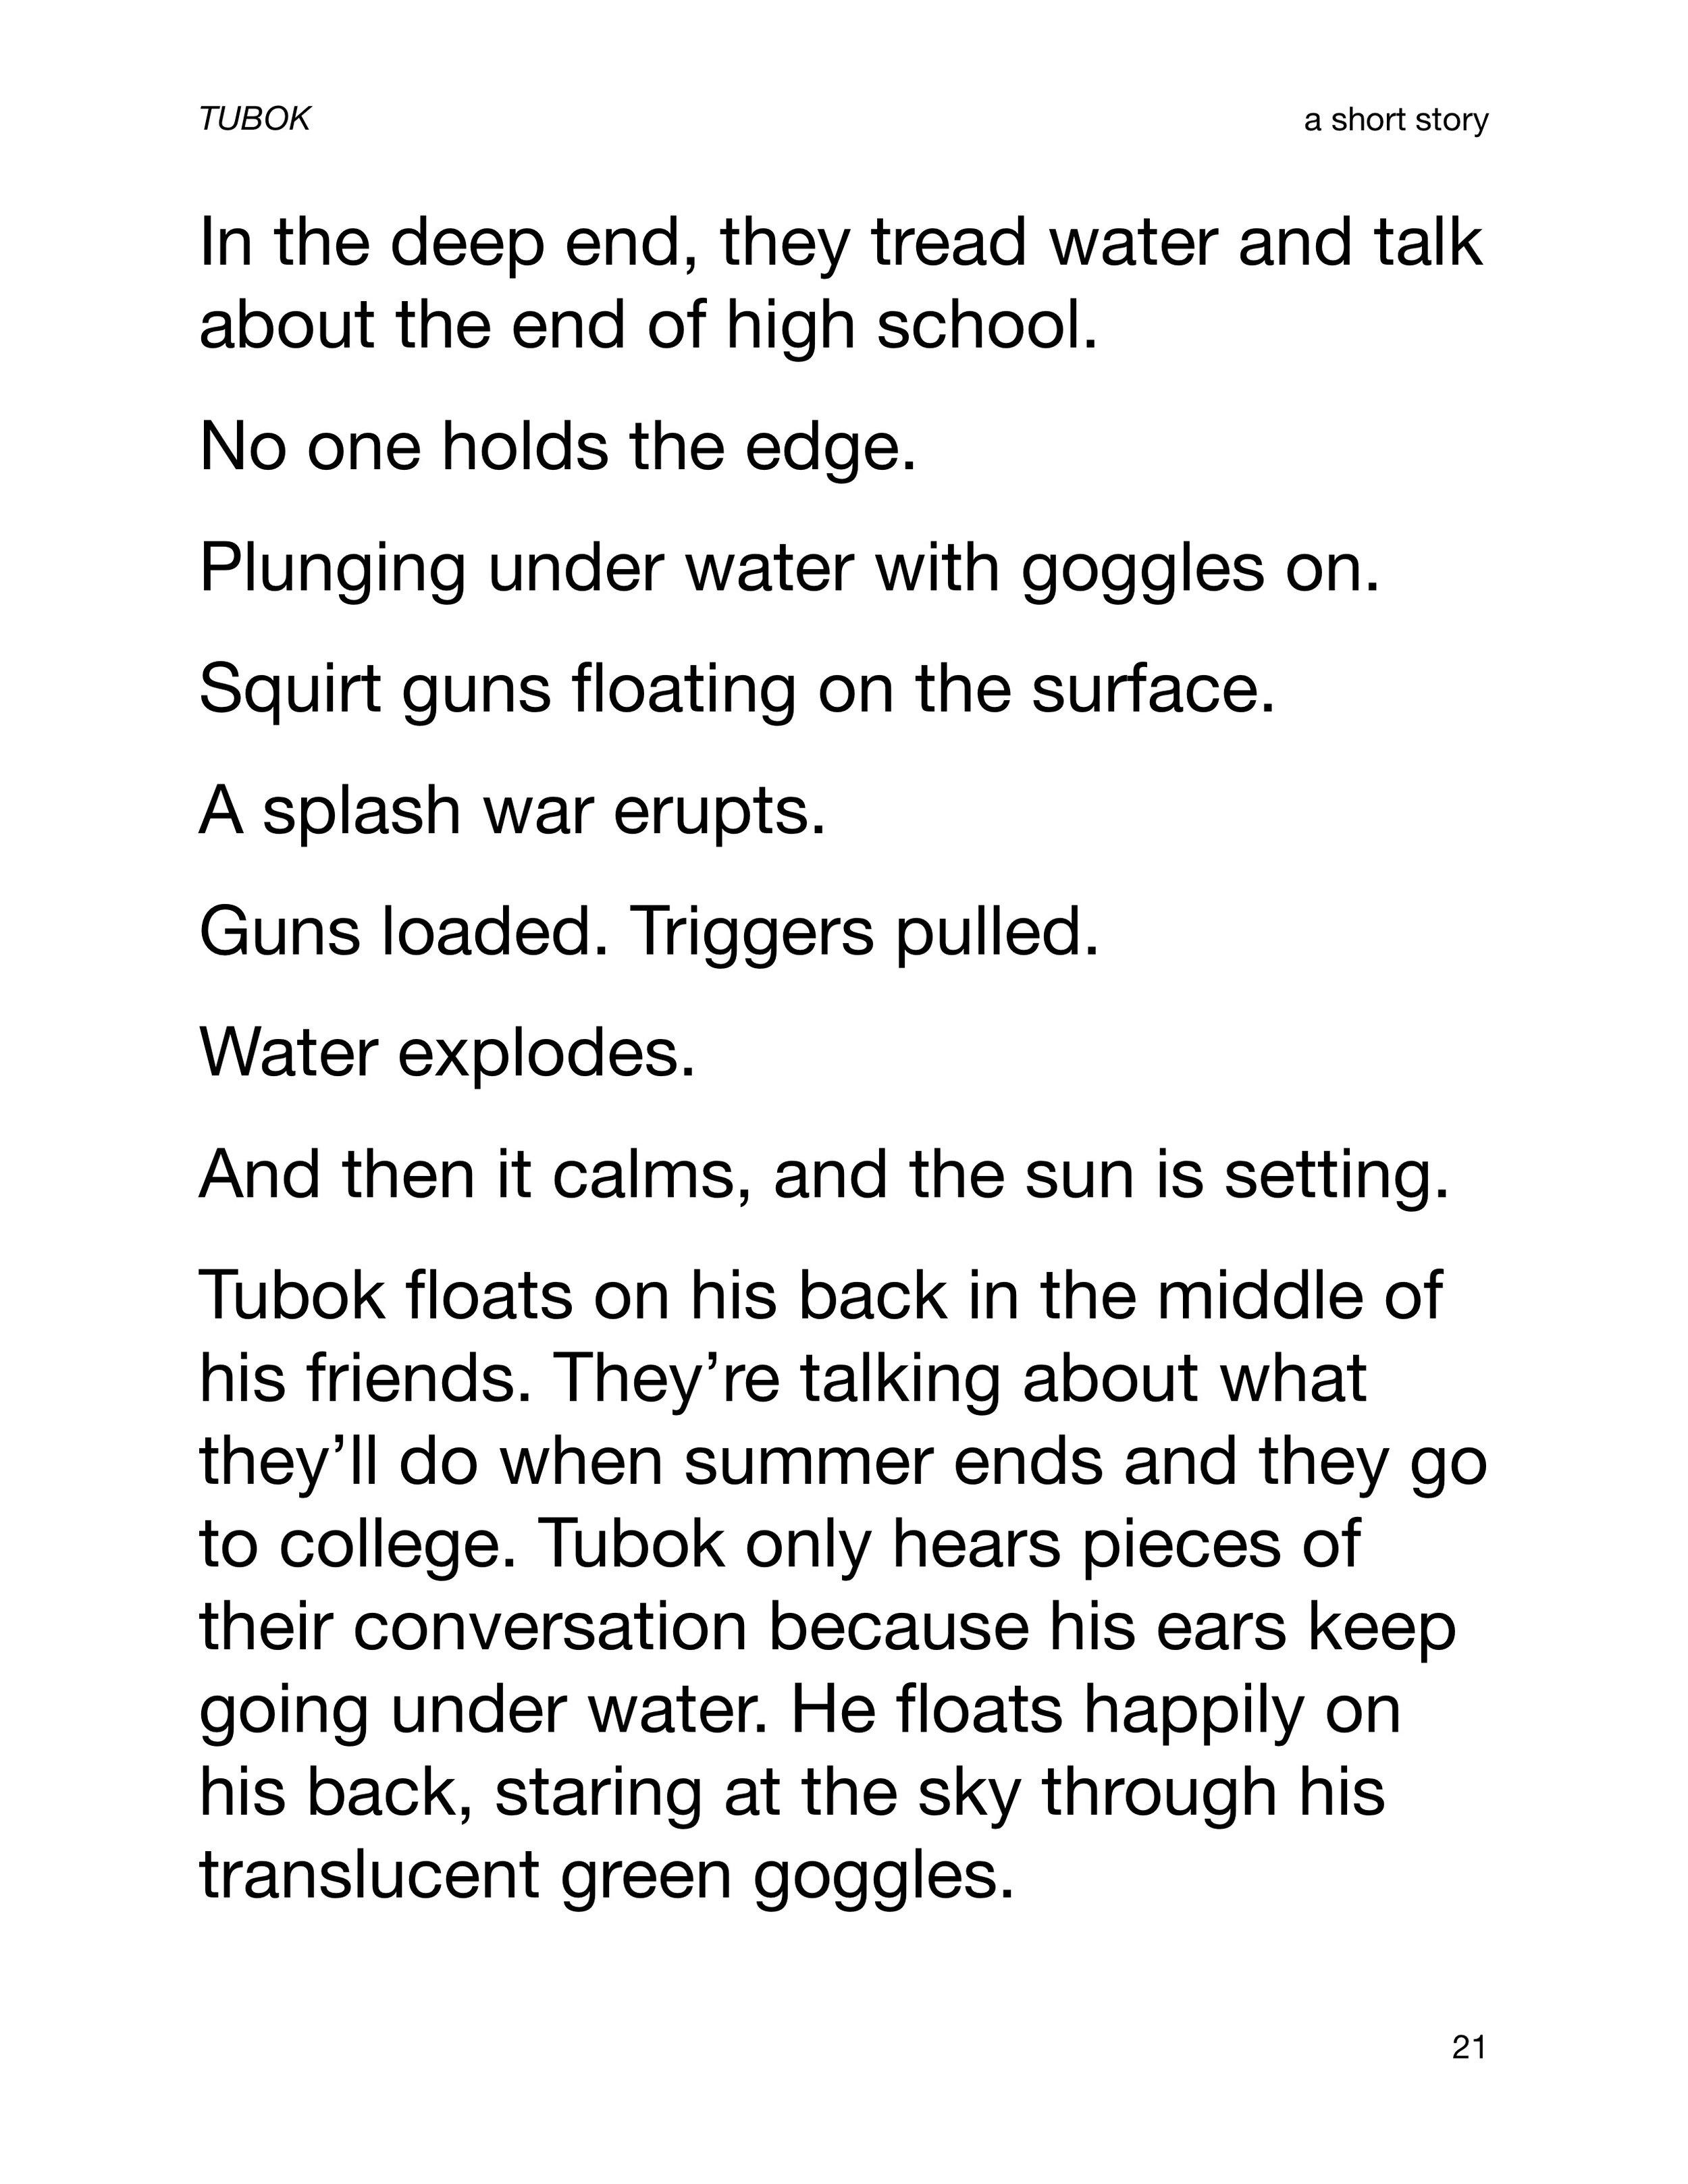 TUBOK (A Short Story) 21.jpg